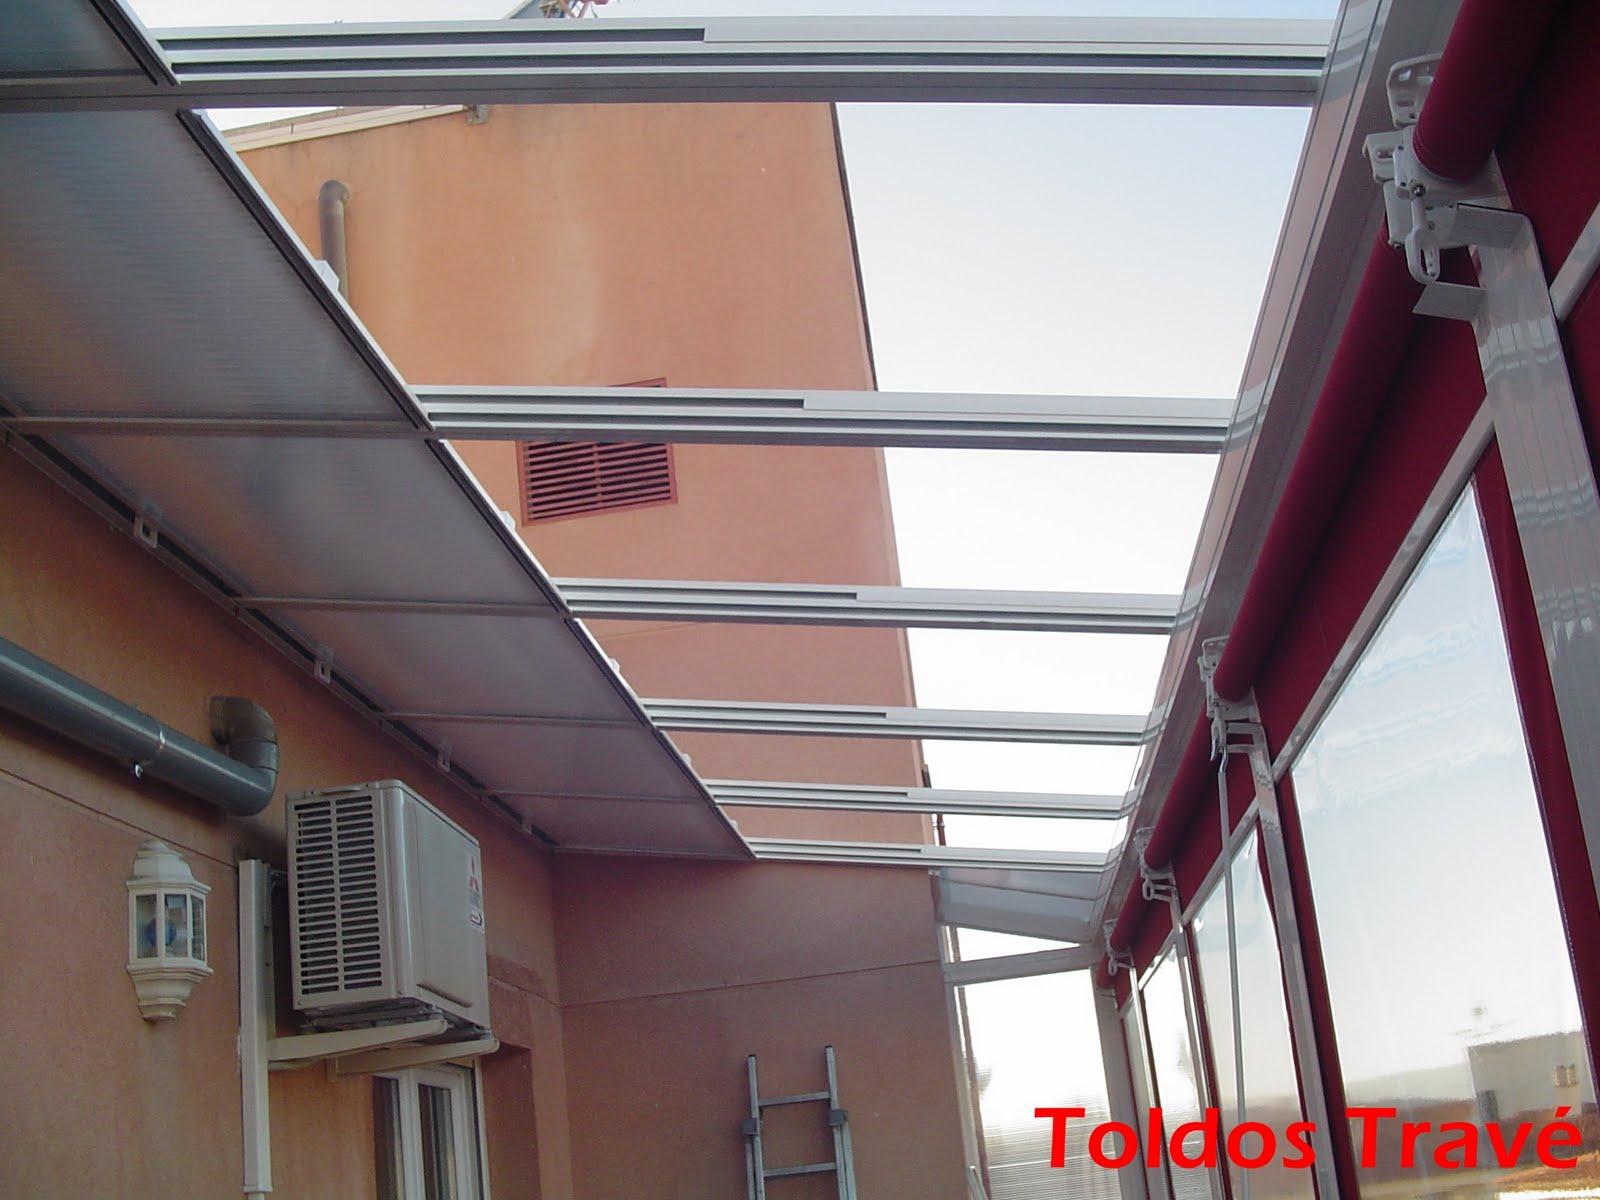 Toldos trav cerramientos ticos for Toldo terraza atico